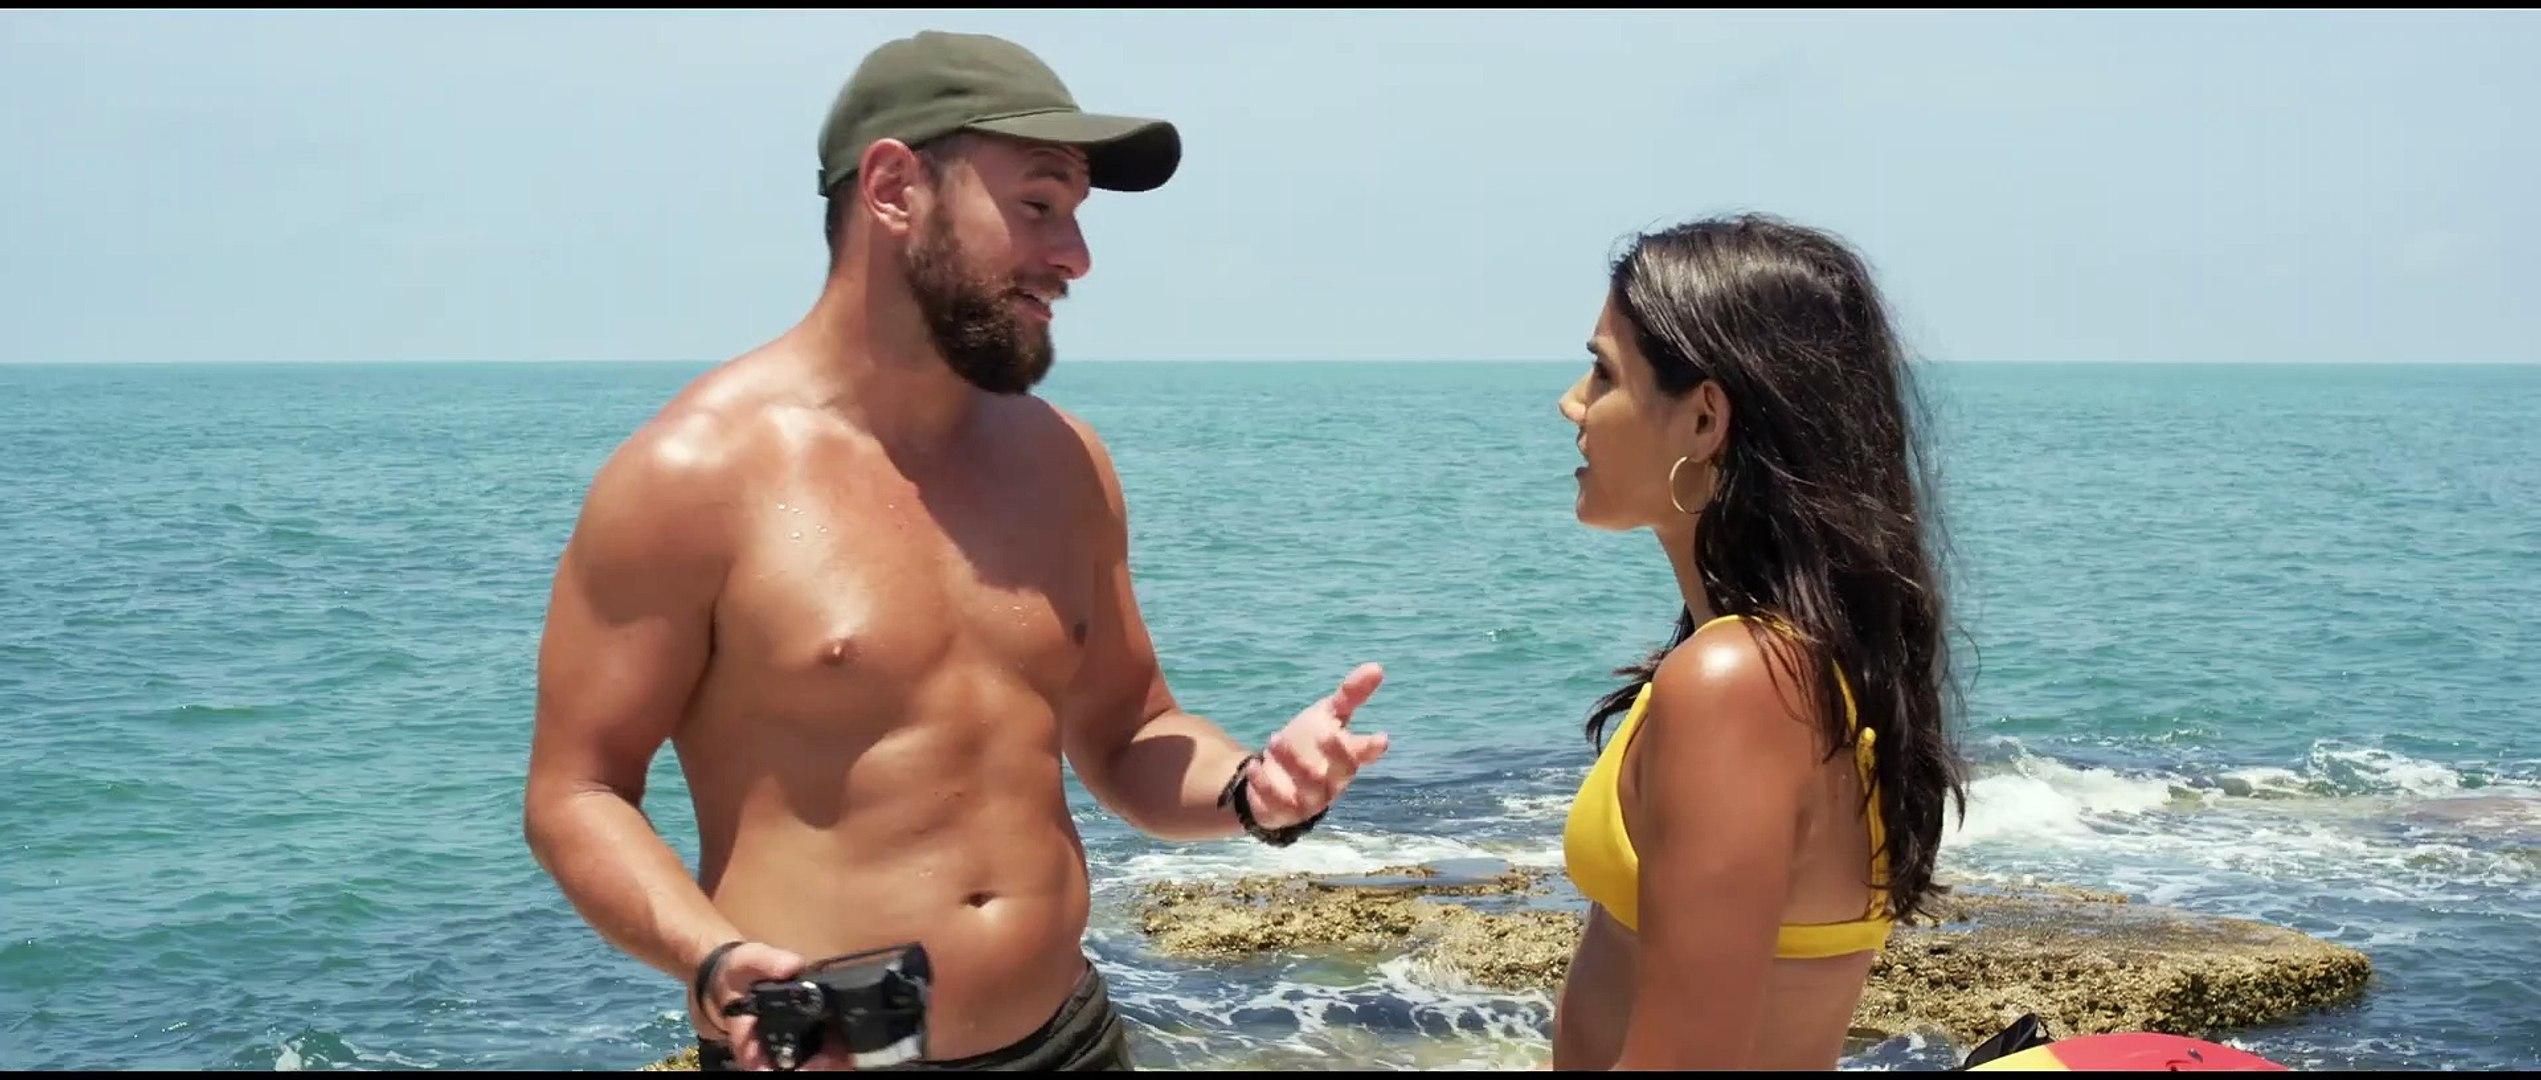 Shark Season Movie - video Dailymotion